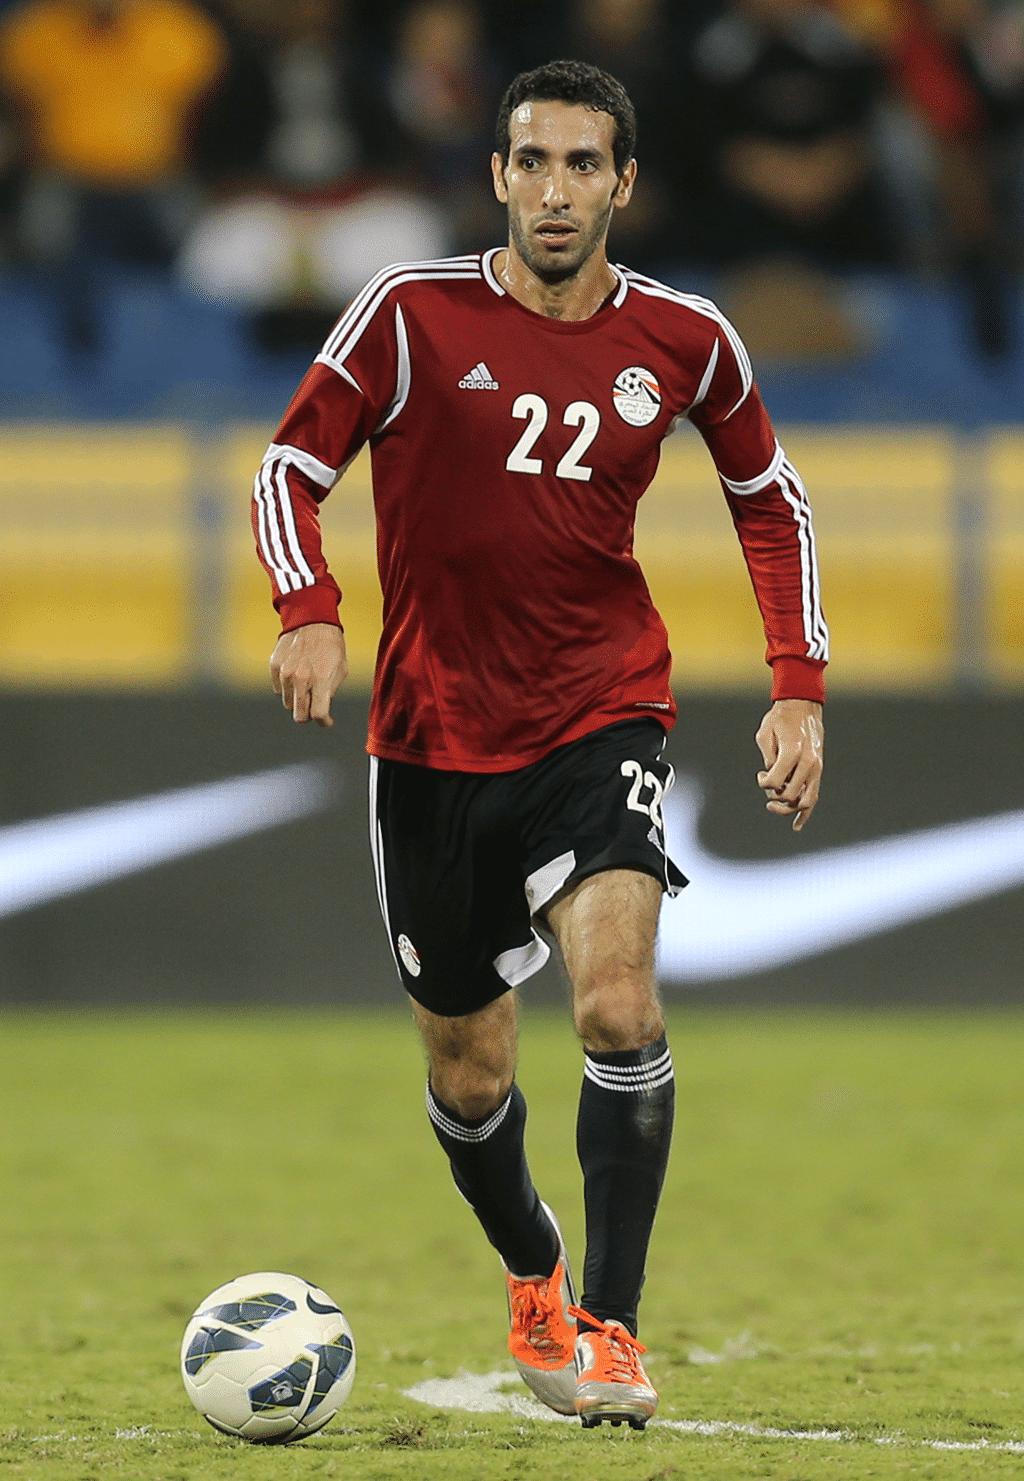 Al-Ahly player Mohamed Abu Treka